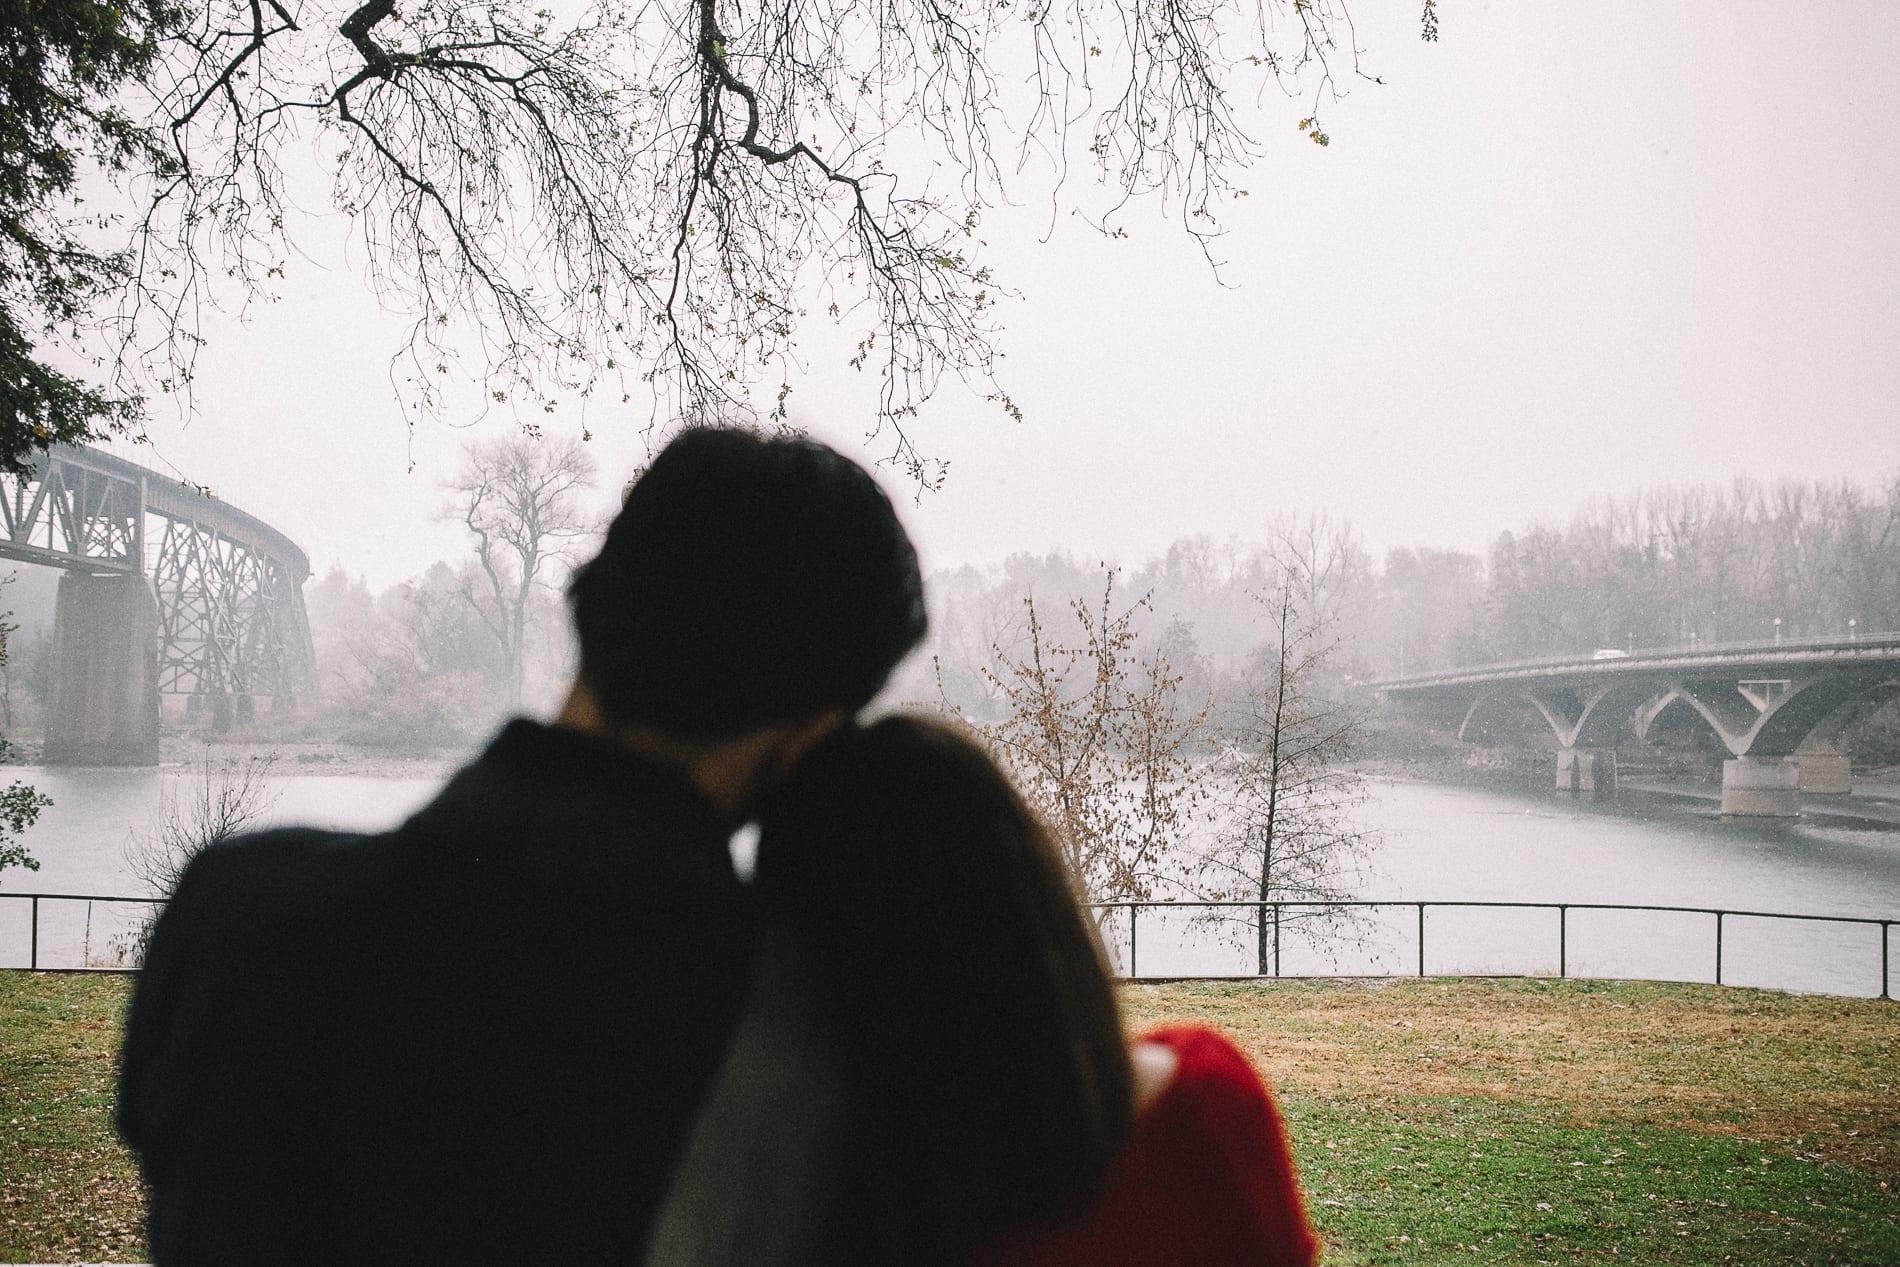 redding-caldwell-lake-park-gazebo-couples-photo-4